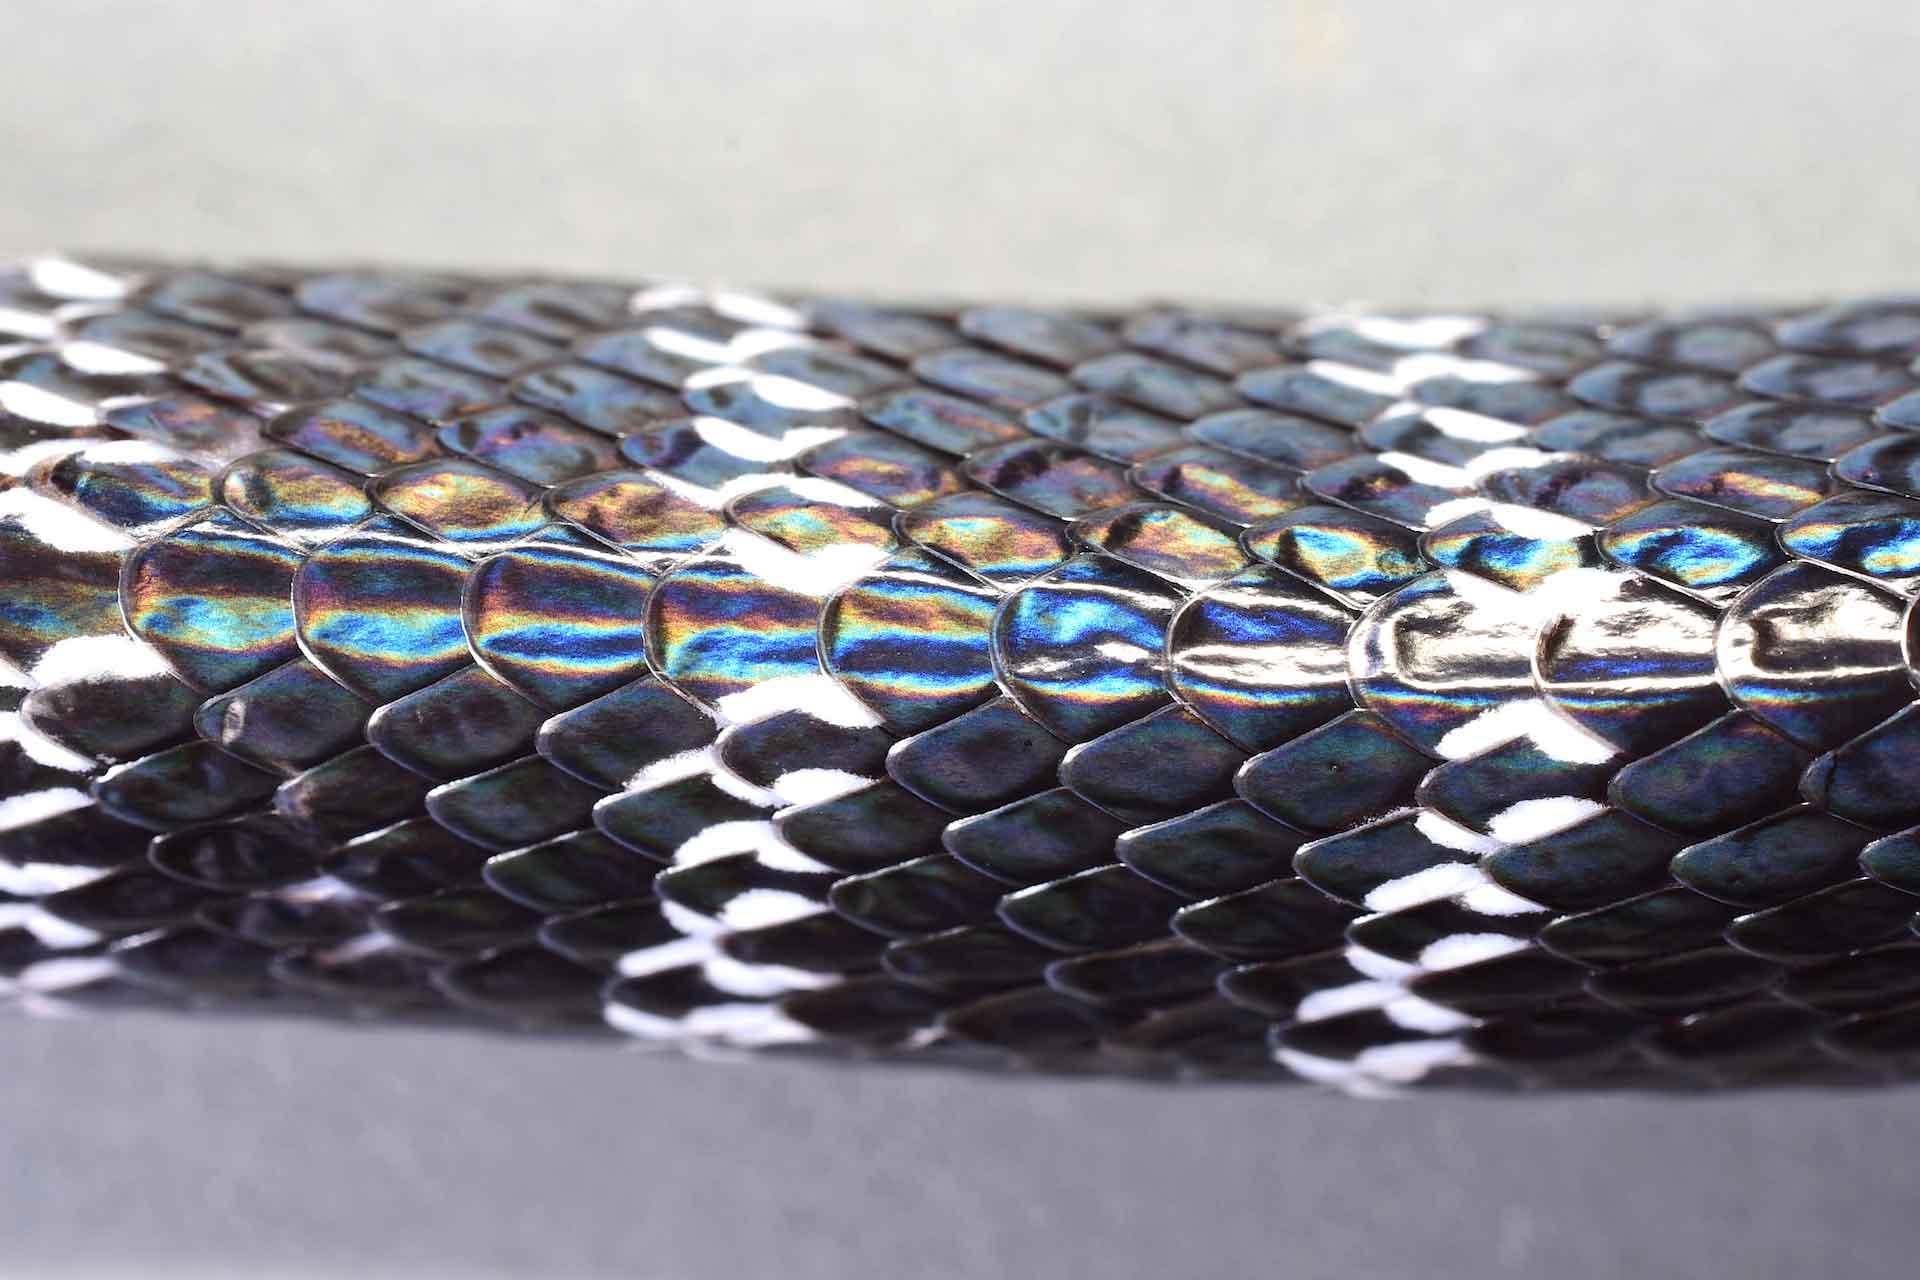 west-sikkim-yuksom-himalayan-krait-bungarus-bungaroides-close-up-scales